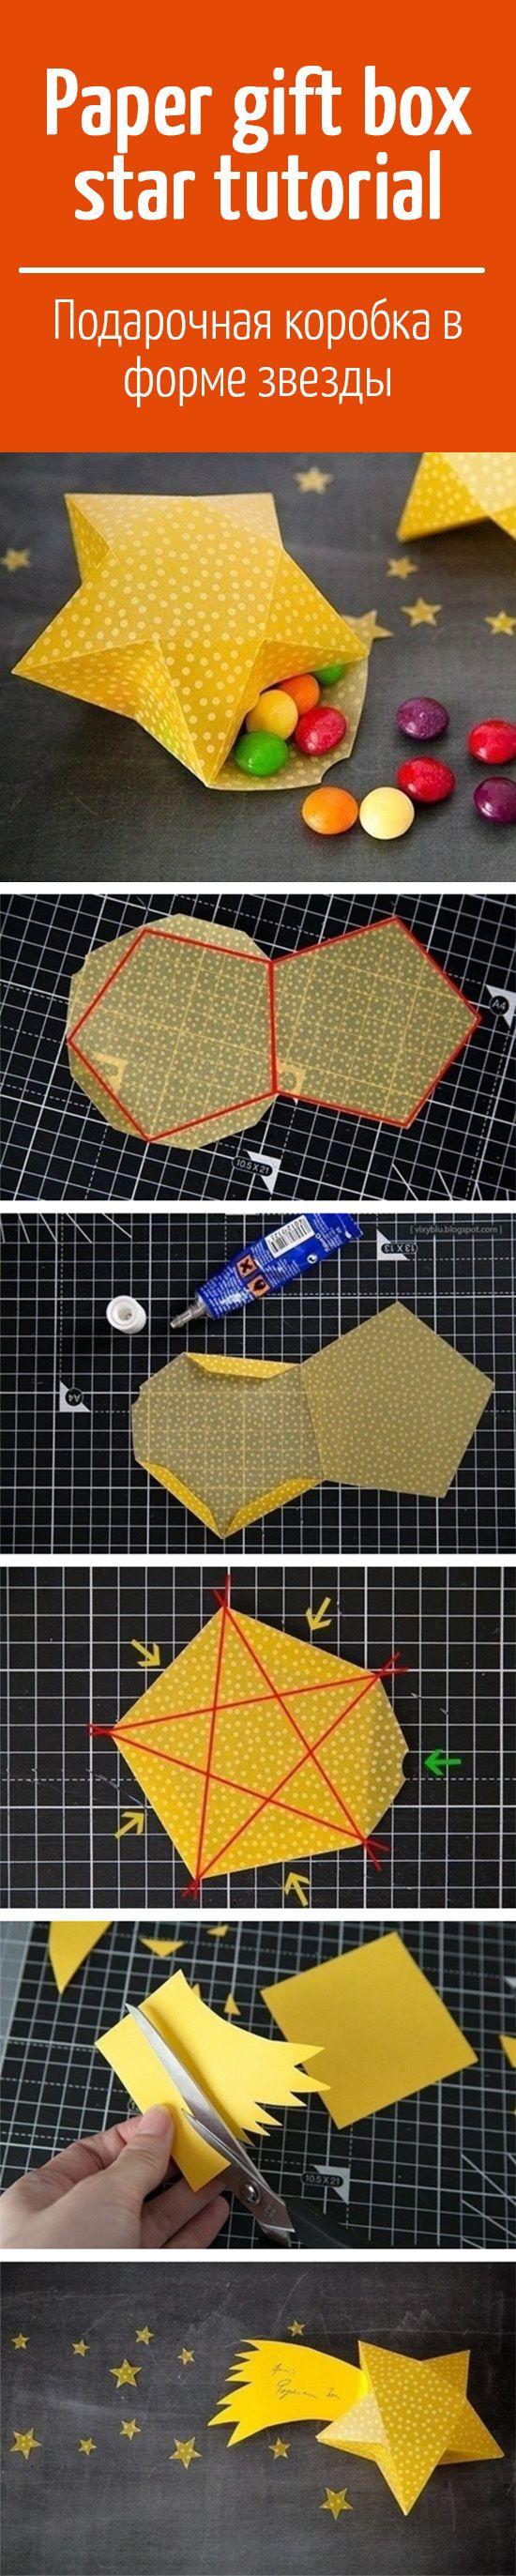 Paper gift box star tutorial / Мастерим из бумаги подарочную коробку в форме звезды